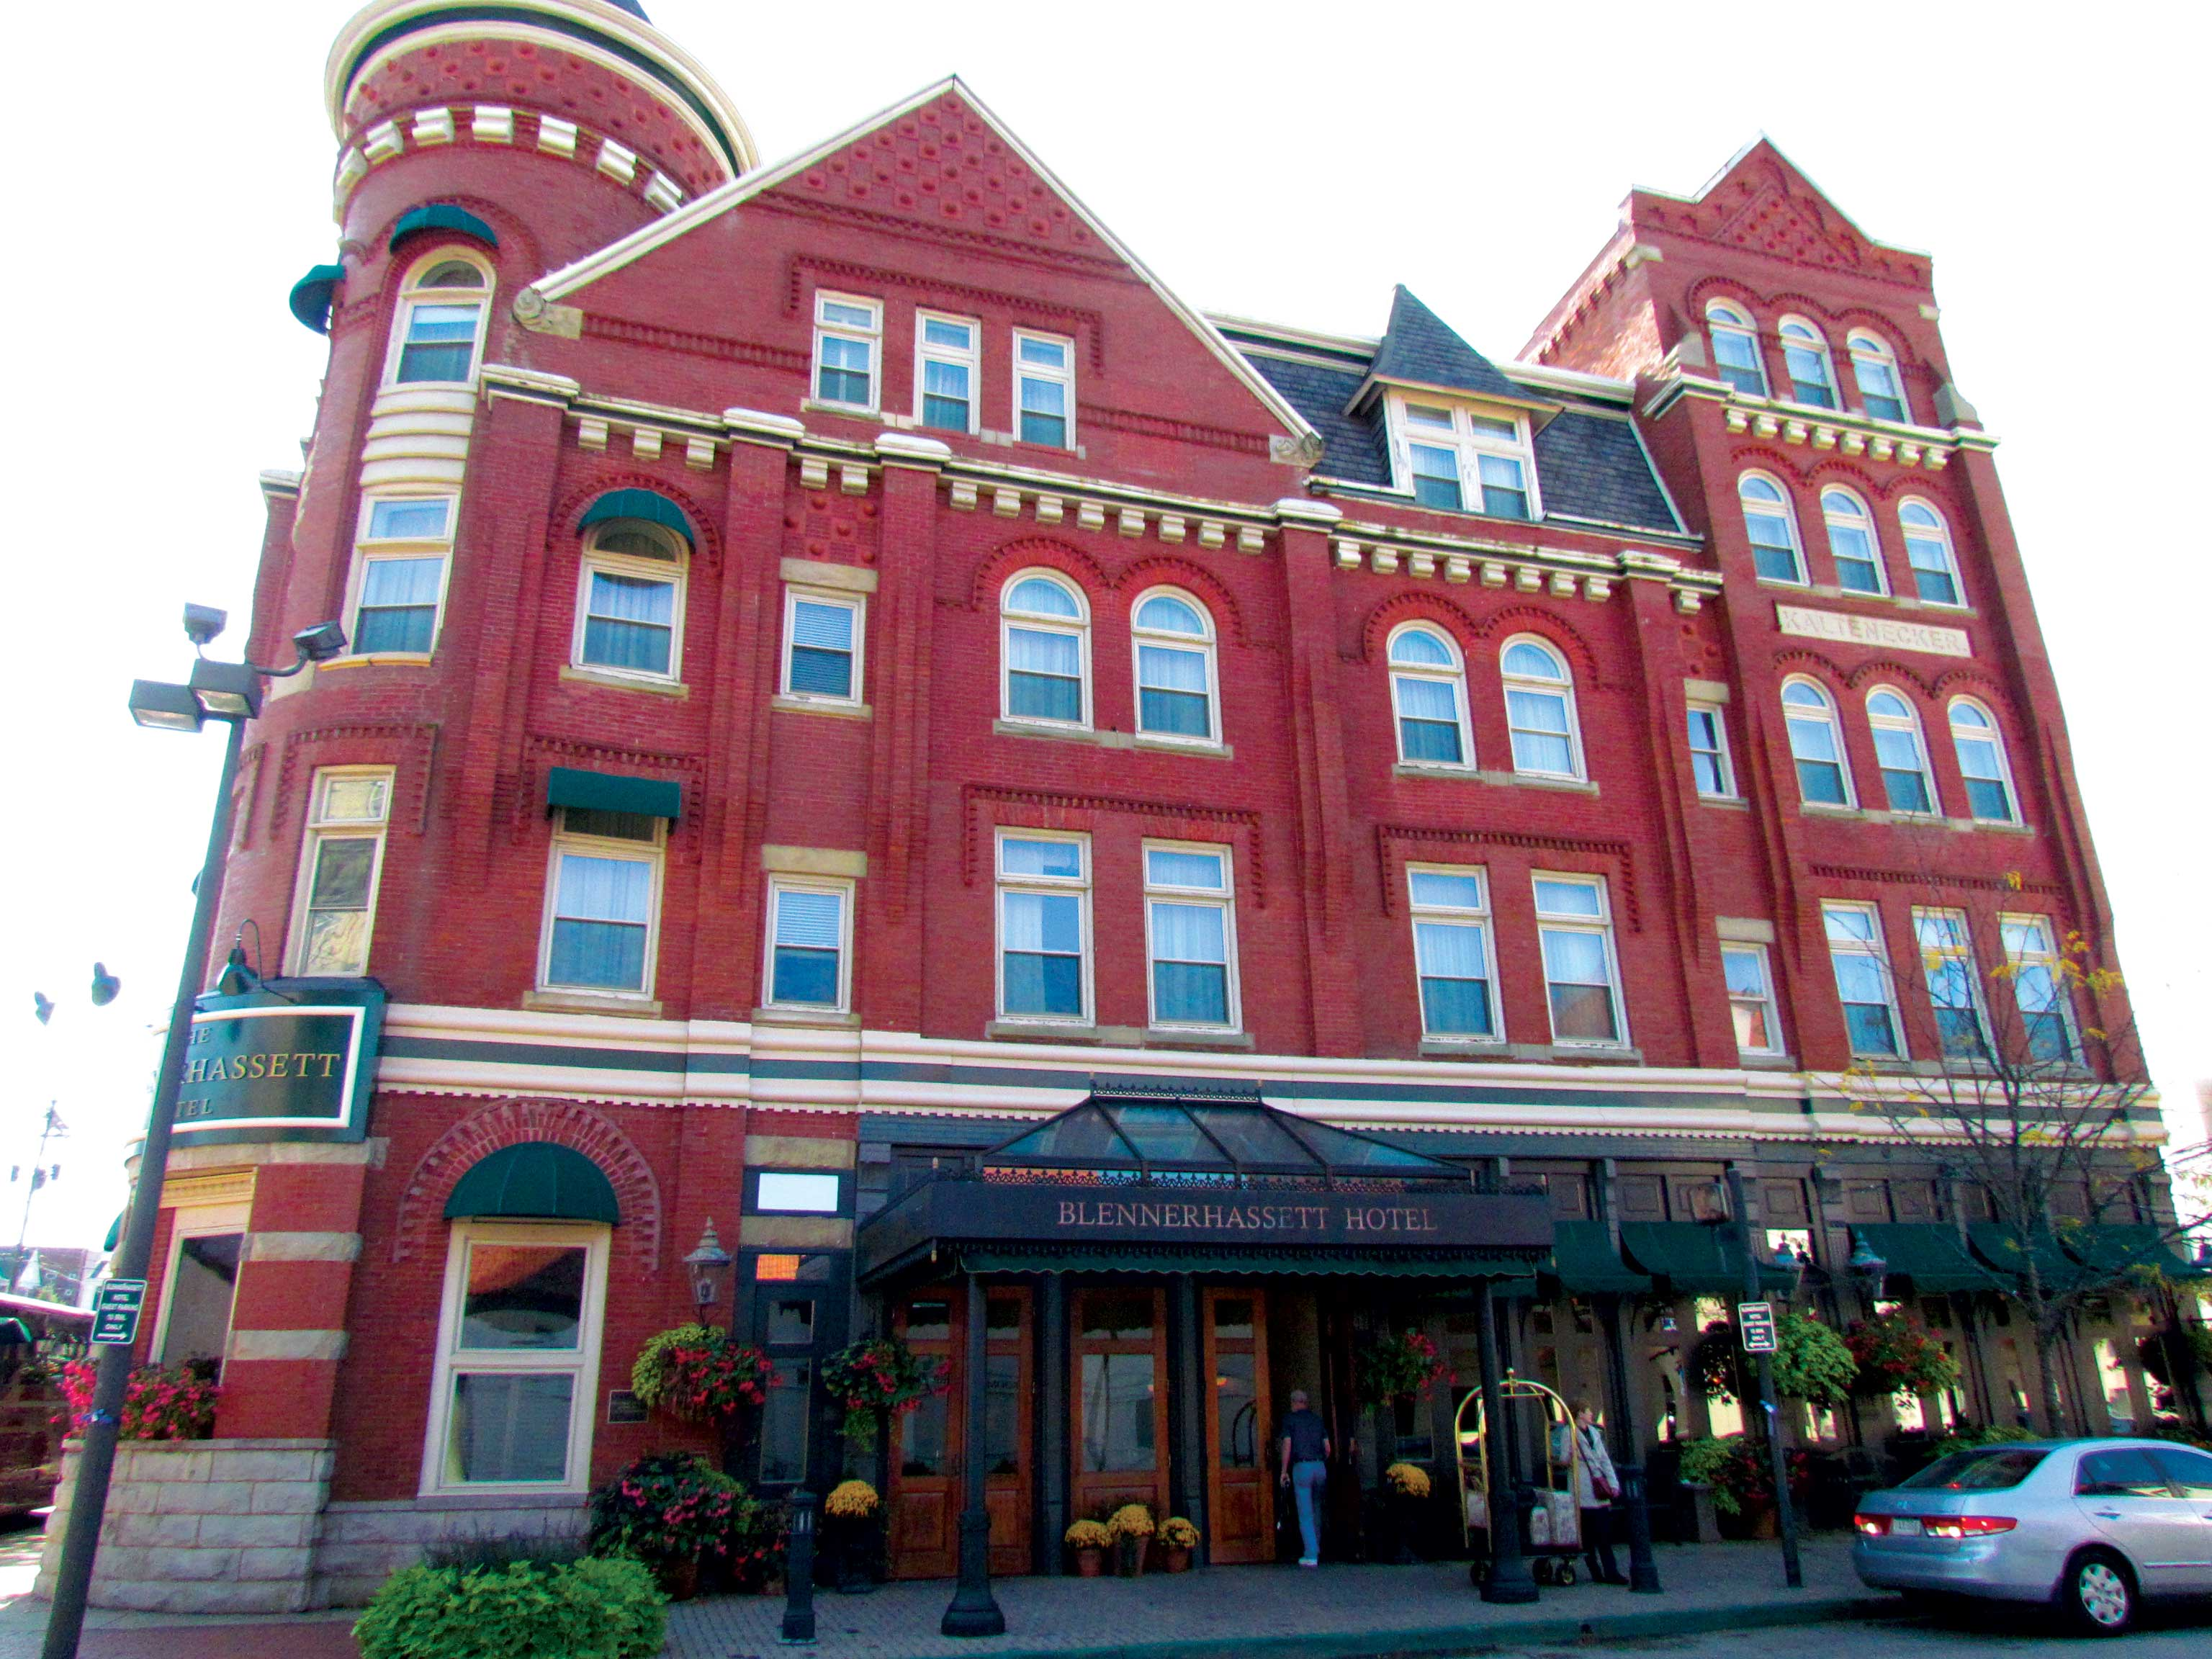 ¿Cuáles son las habitaciones y el hotel Blennerhassett Blennerhassett (Desde)